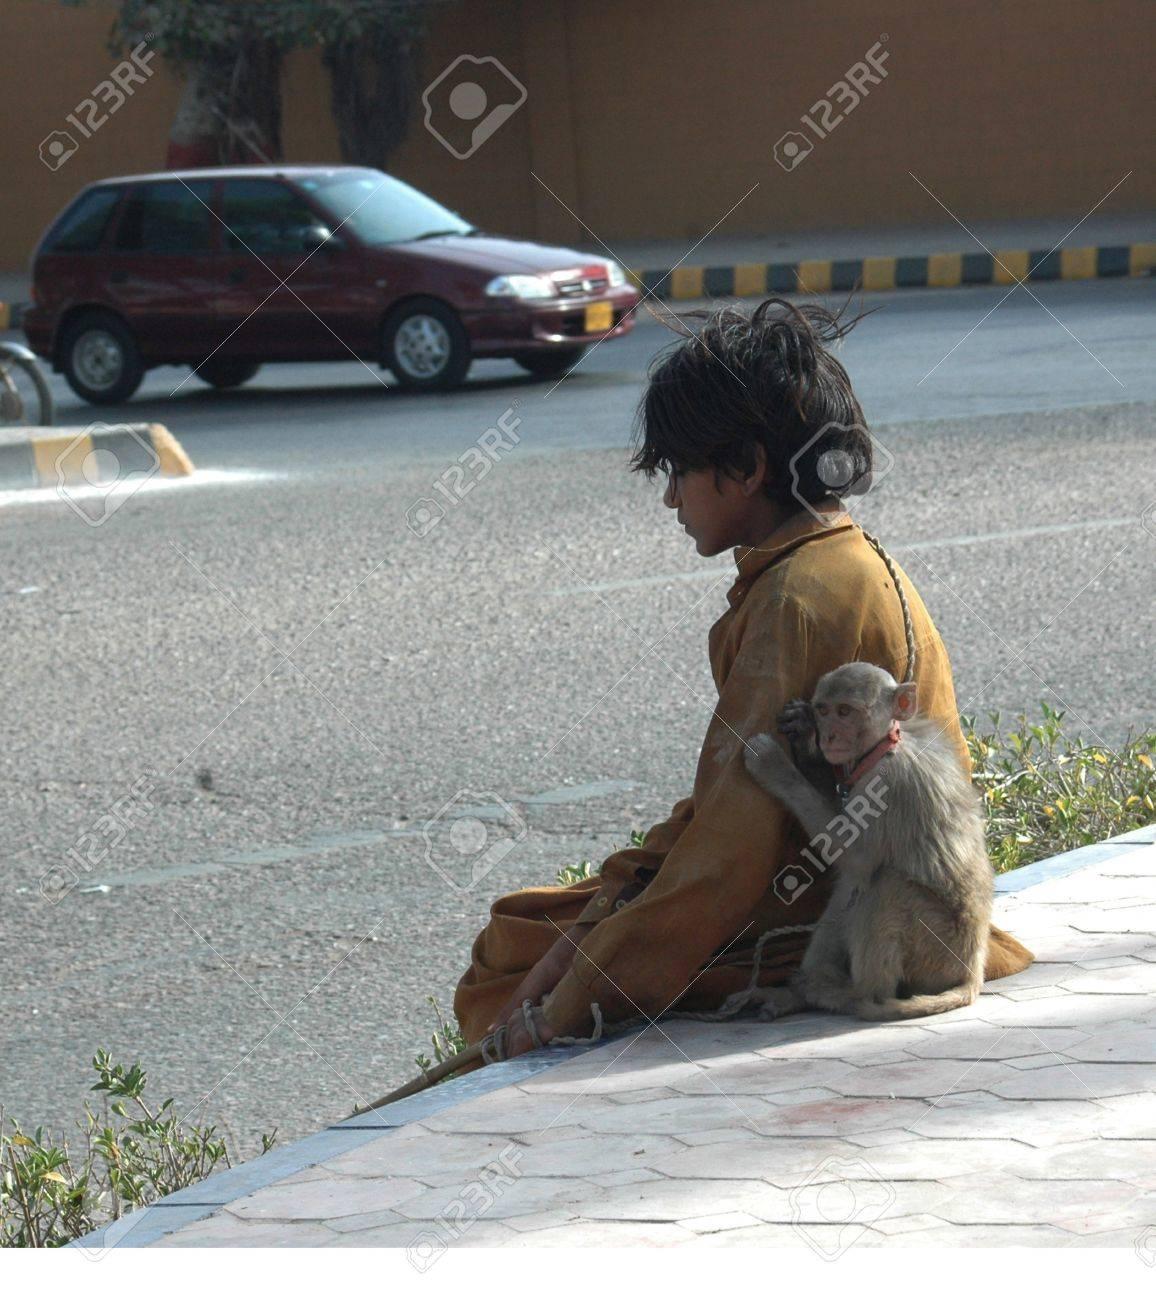 PAKISTAN_KARACHI_Young teen age boy monkey charmer he makes living to show  monkey actin to public and